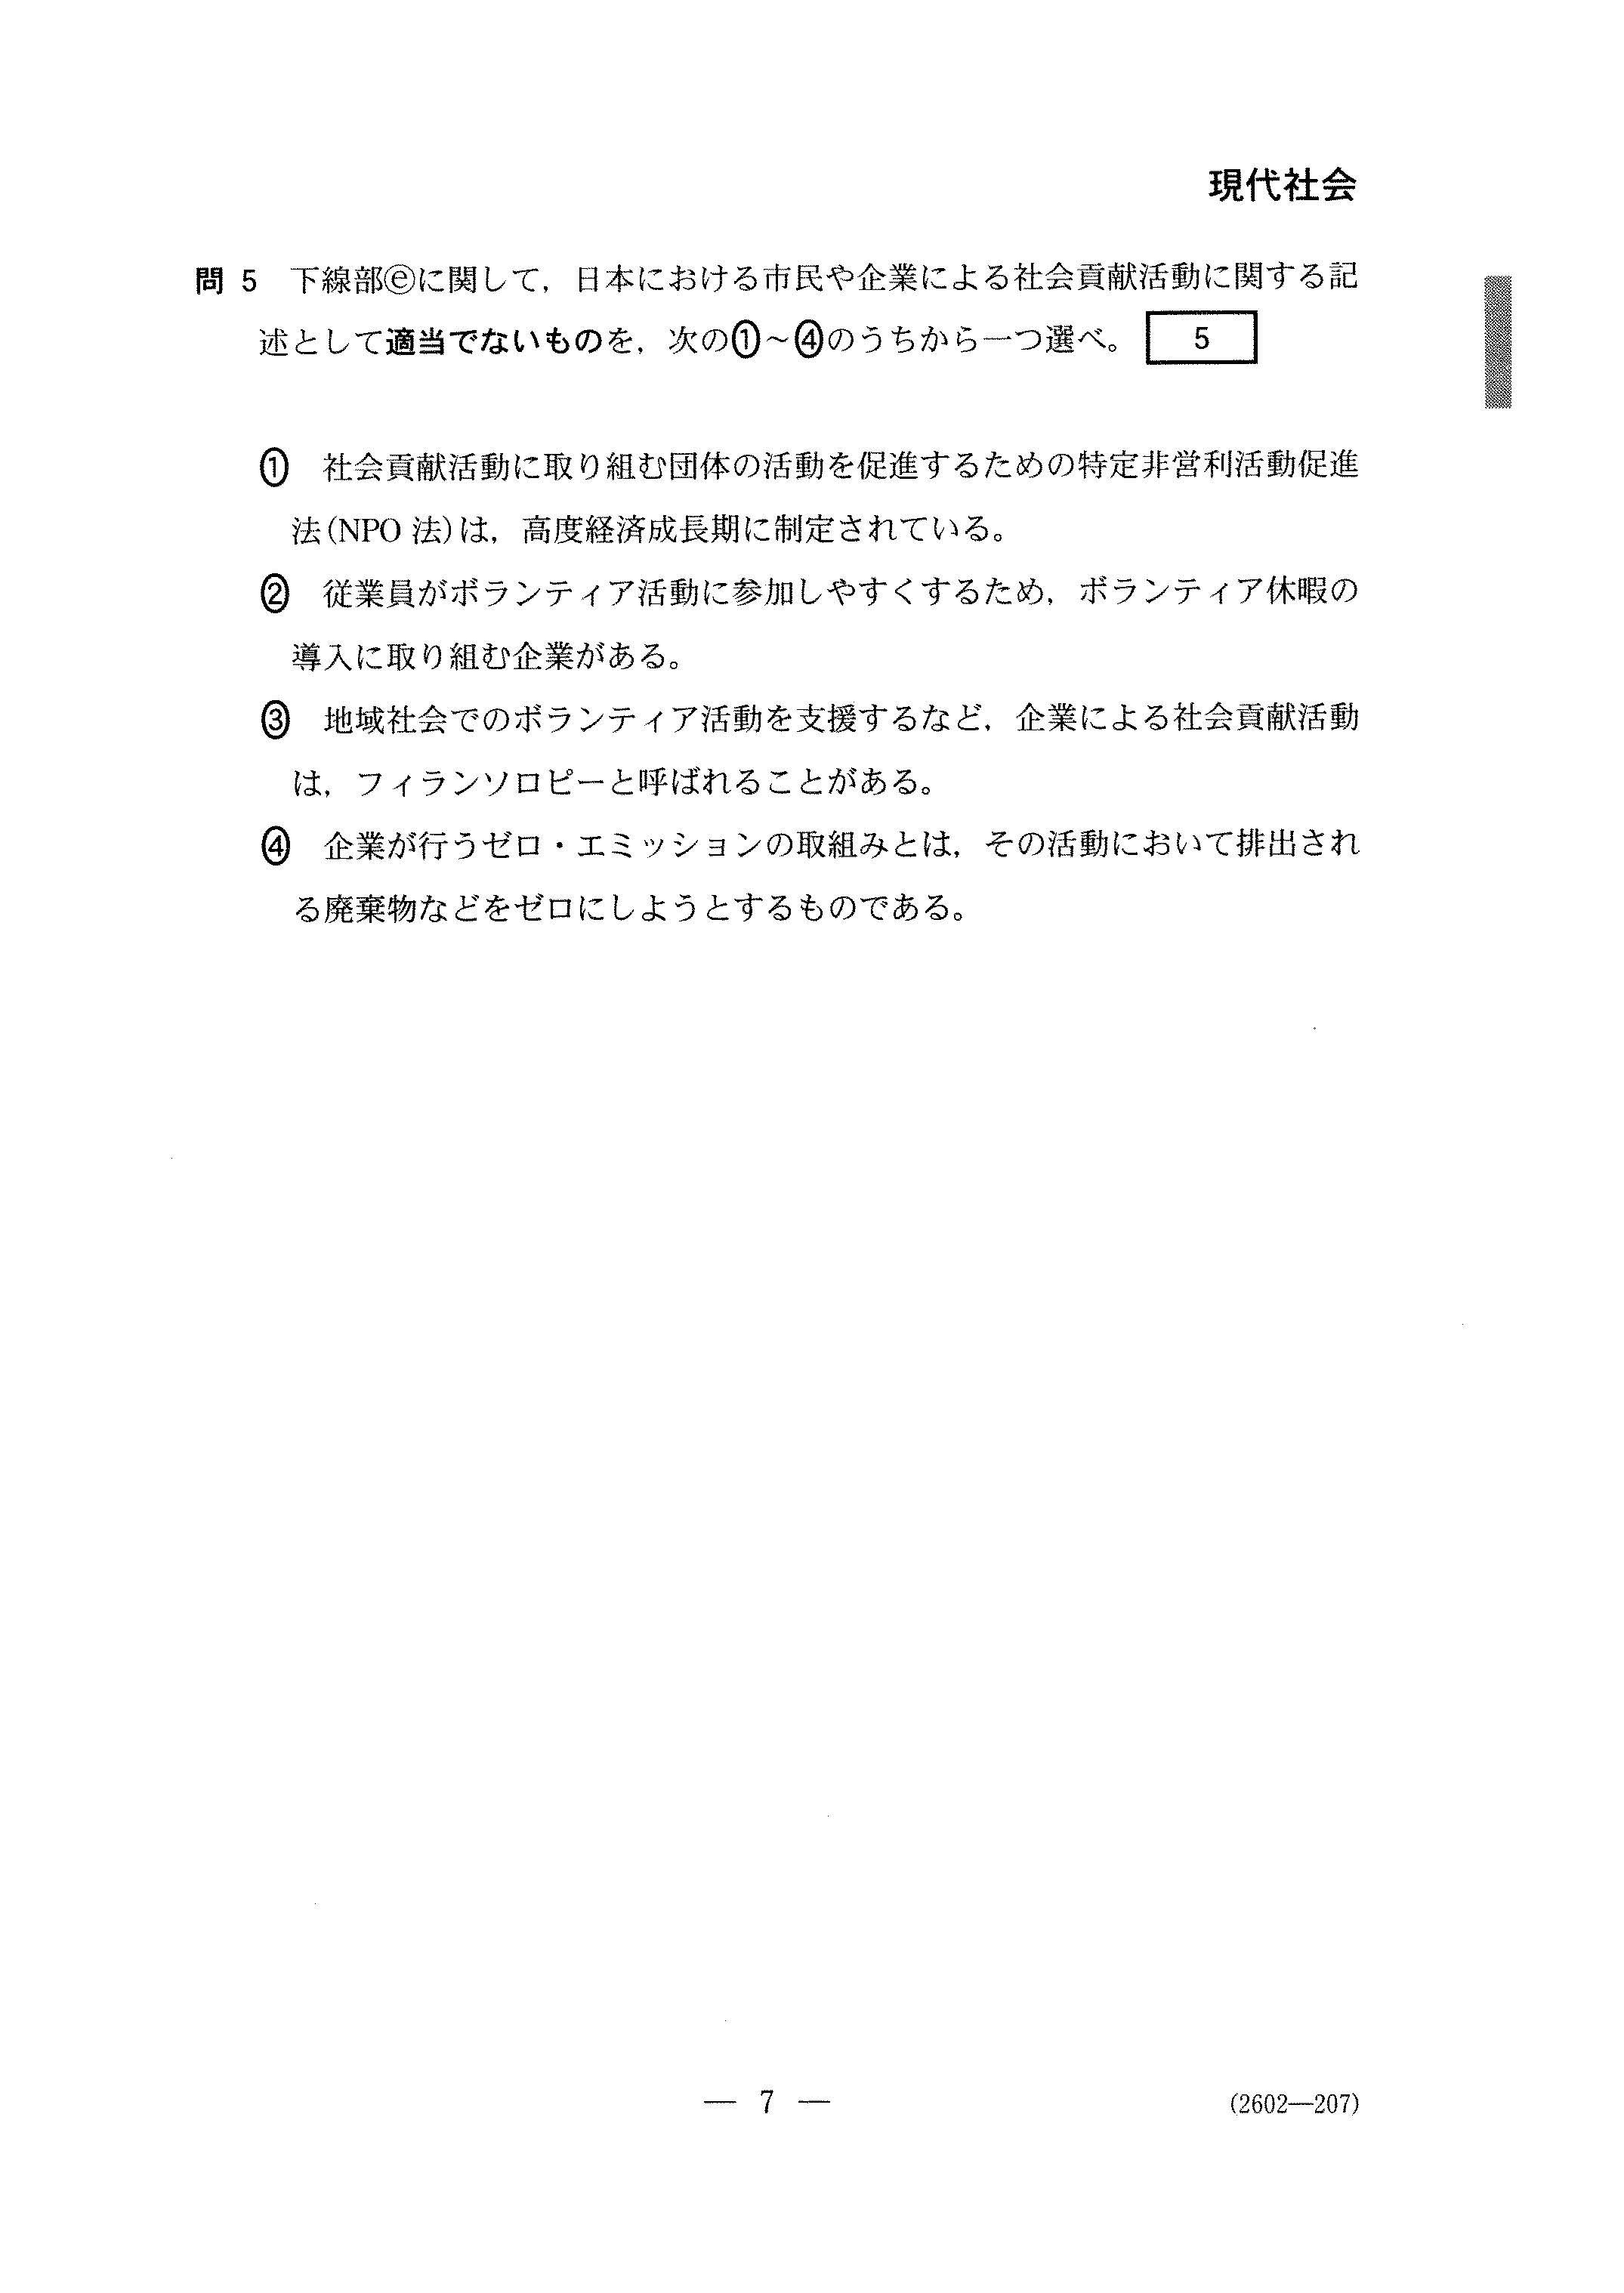 H29現代社会 大学入試センター試験過去問